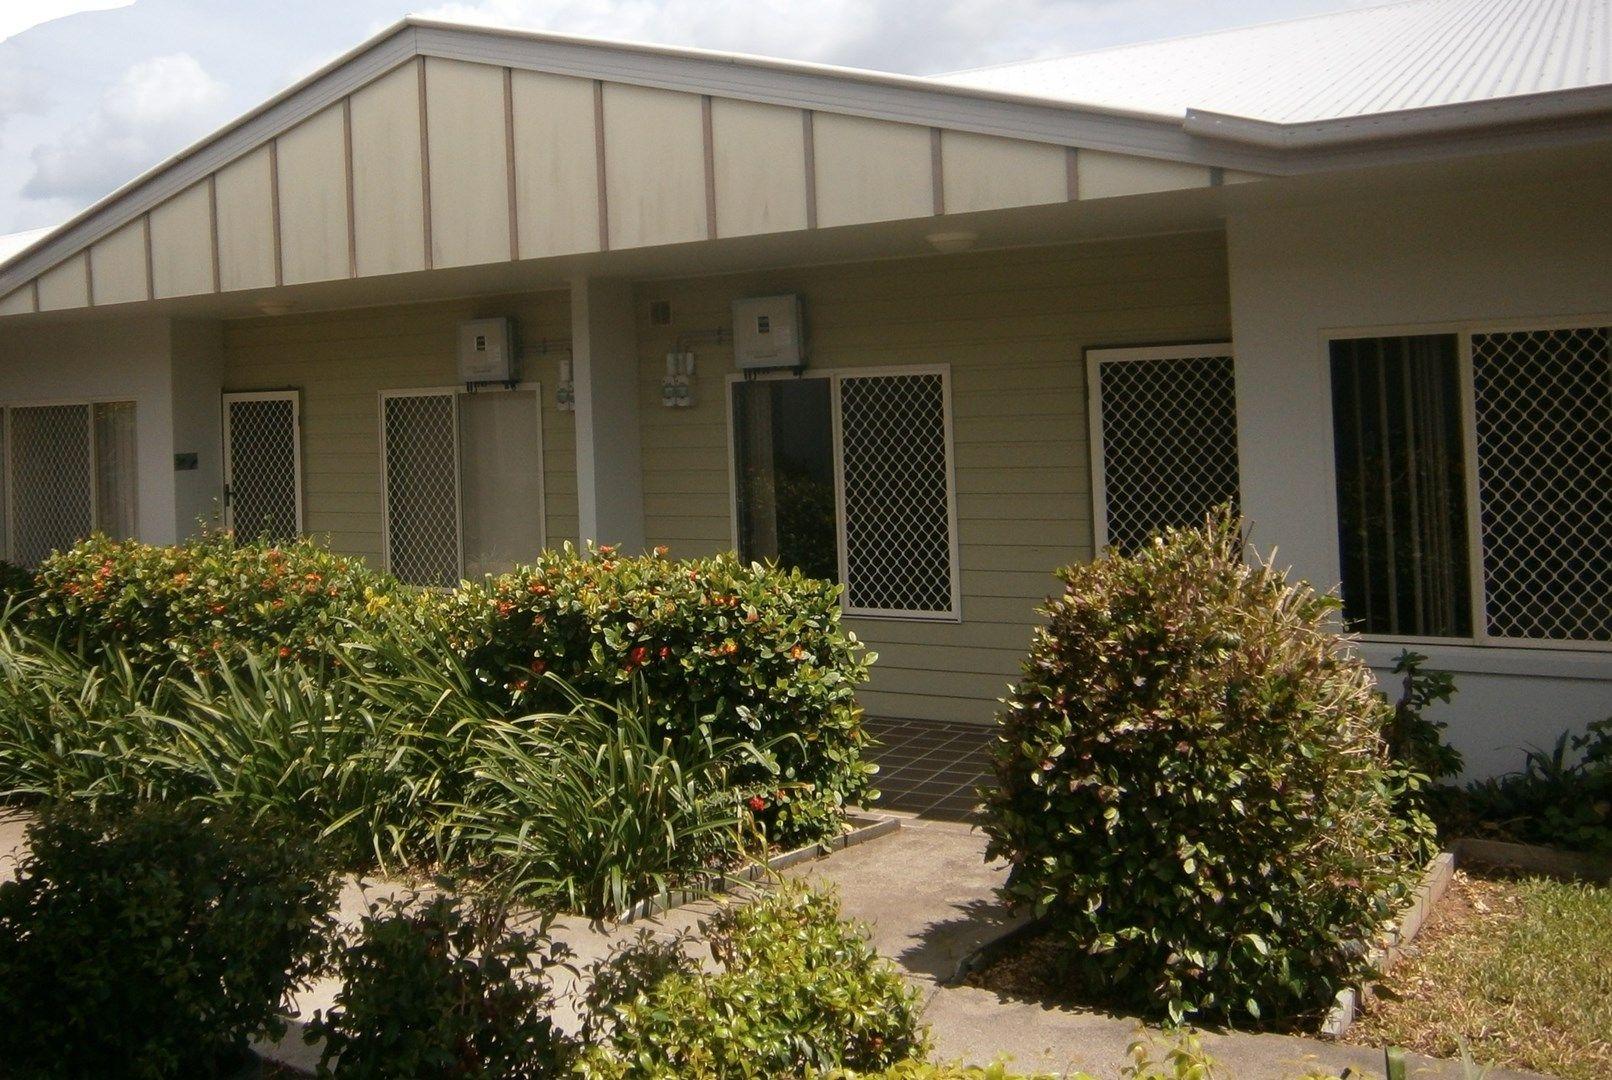 36/14 Pauline Martin Drive, Rockhampton City QLD 4700, Image 0